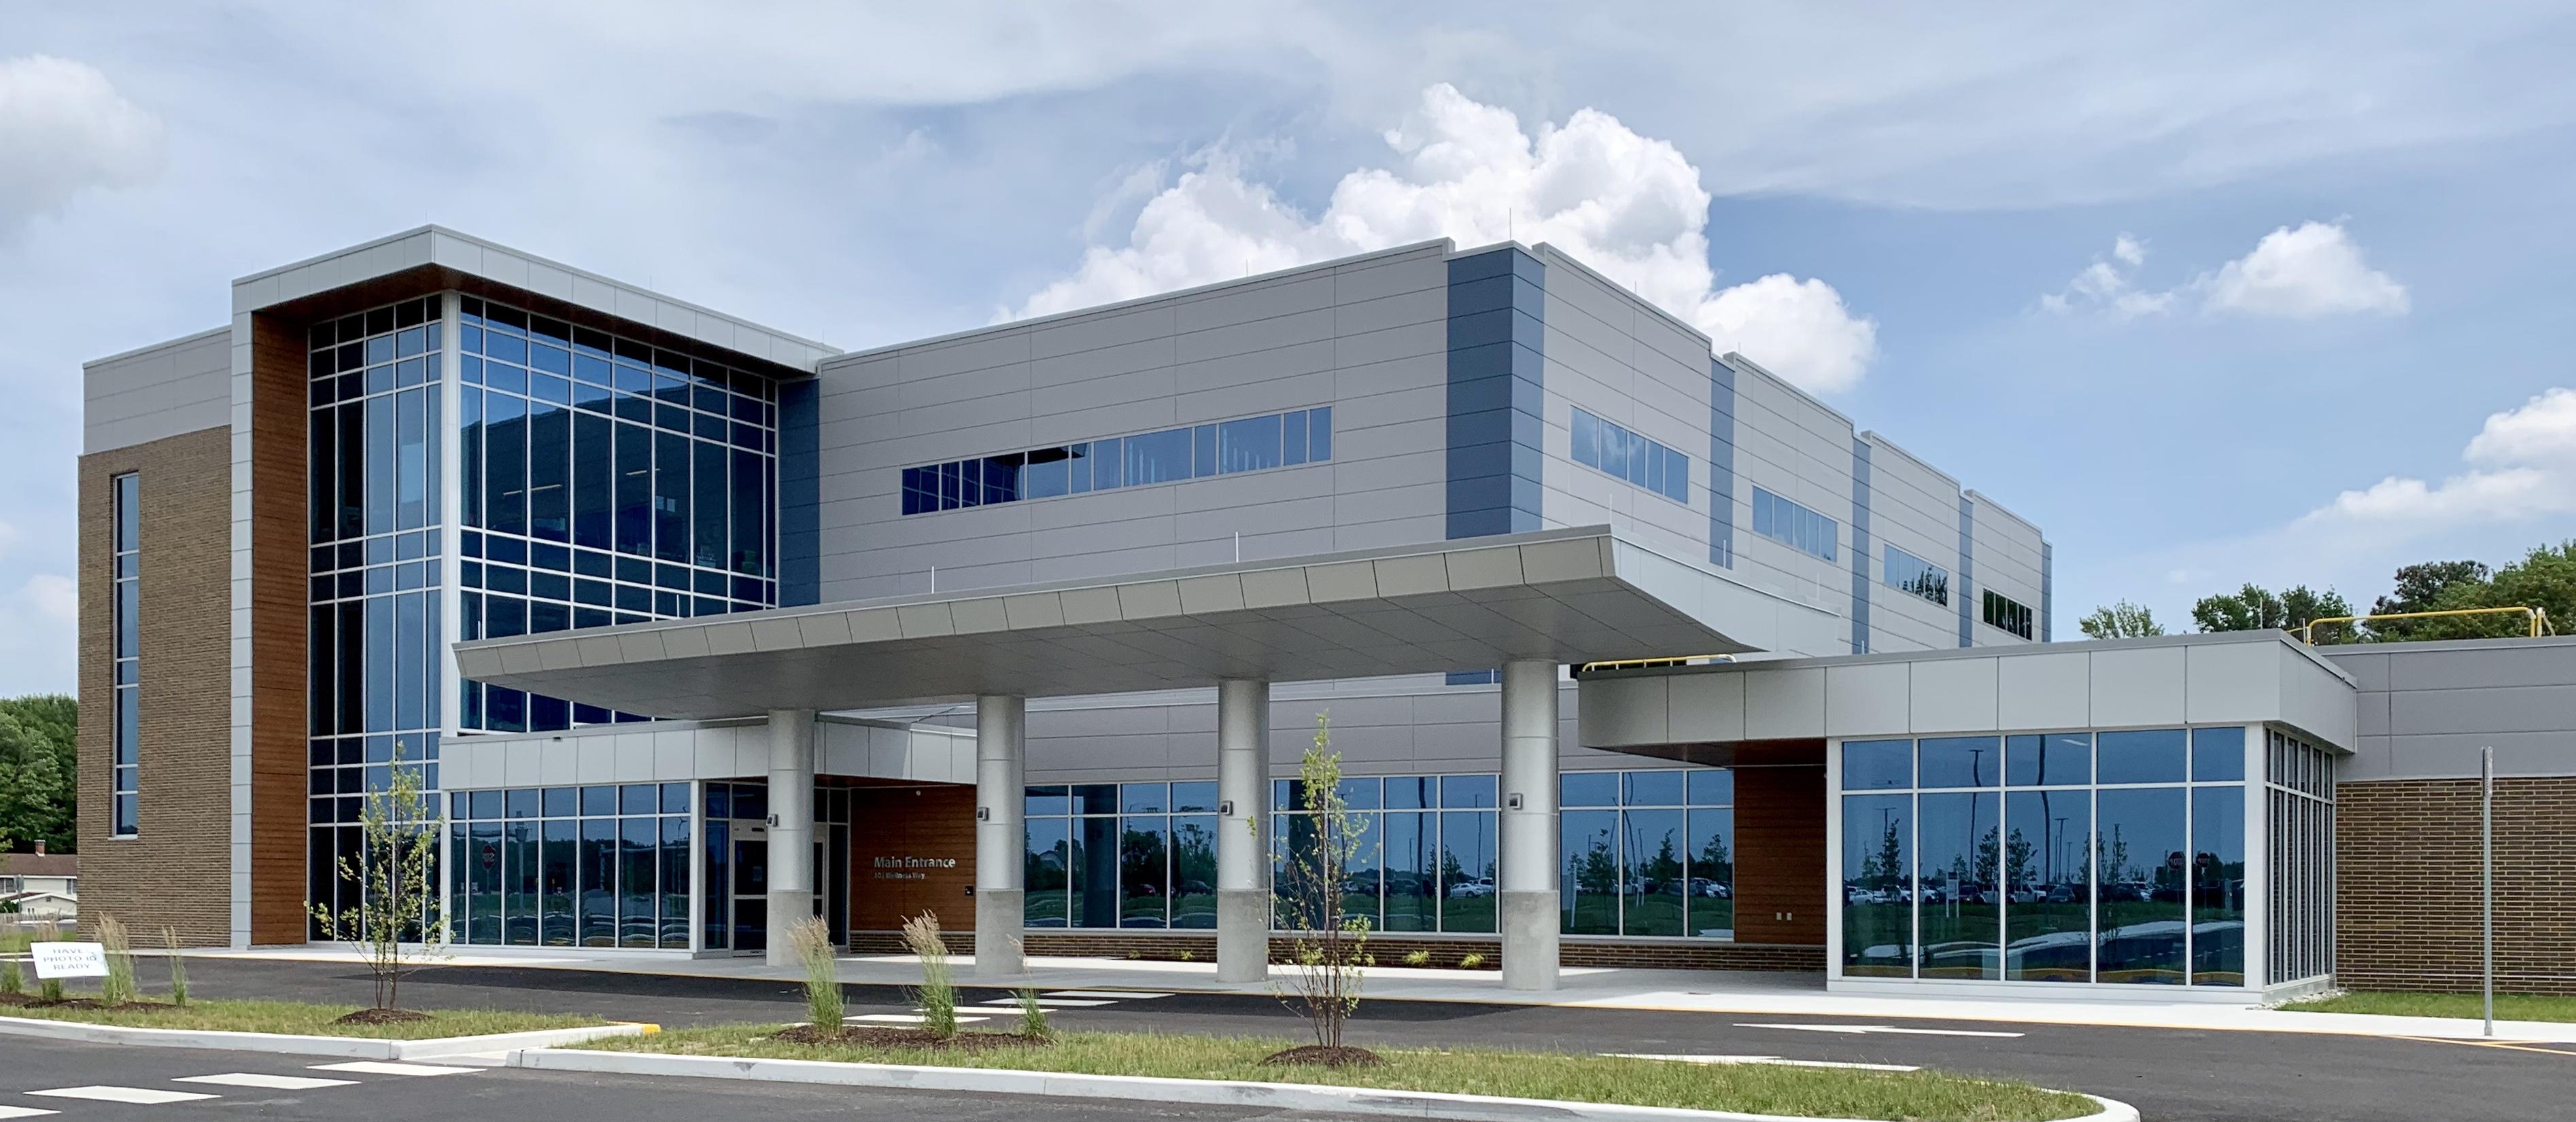 NEMOURS SUSSEX MEDICAL OFFICE BUILDING, Milford, DE